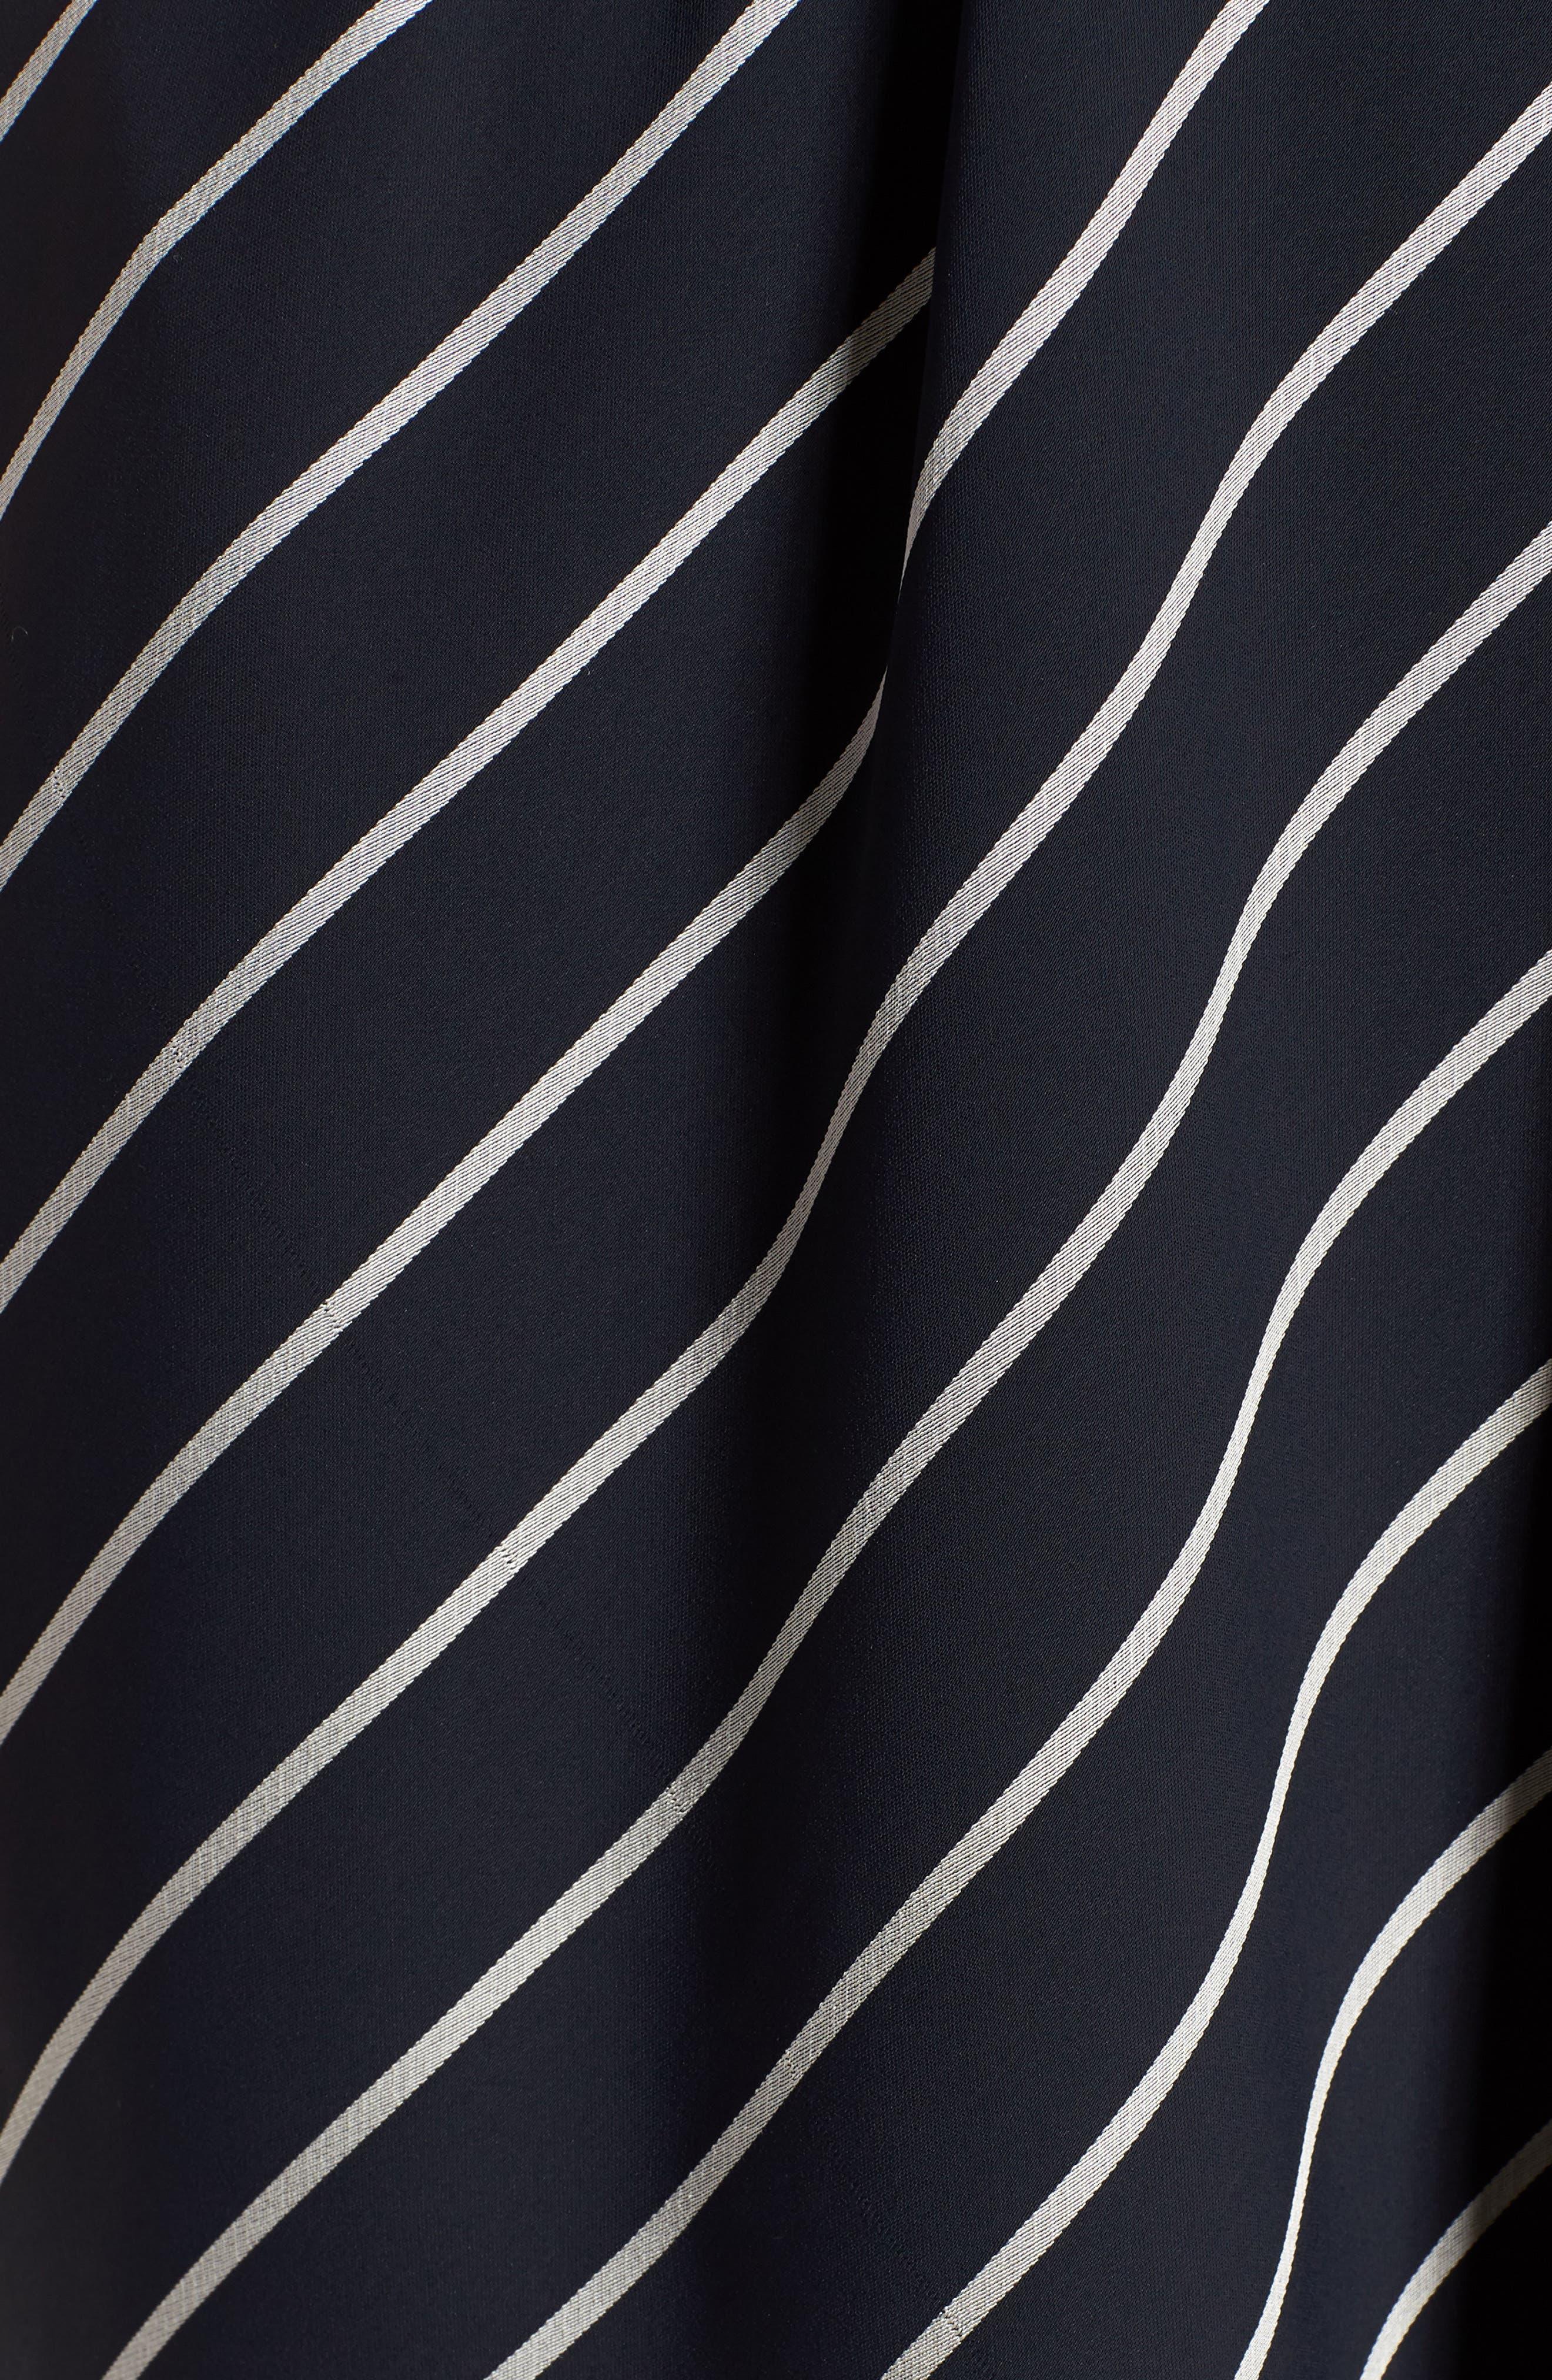 Pinstripe Ruffle Wrap Dress,                             Alternate thumbnail 6, color,